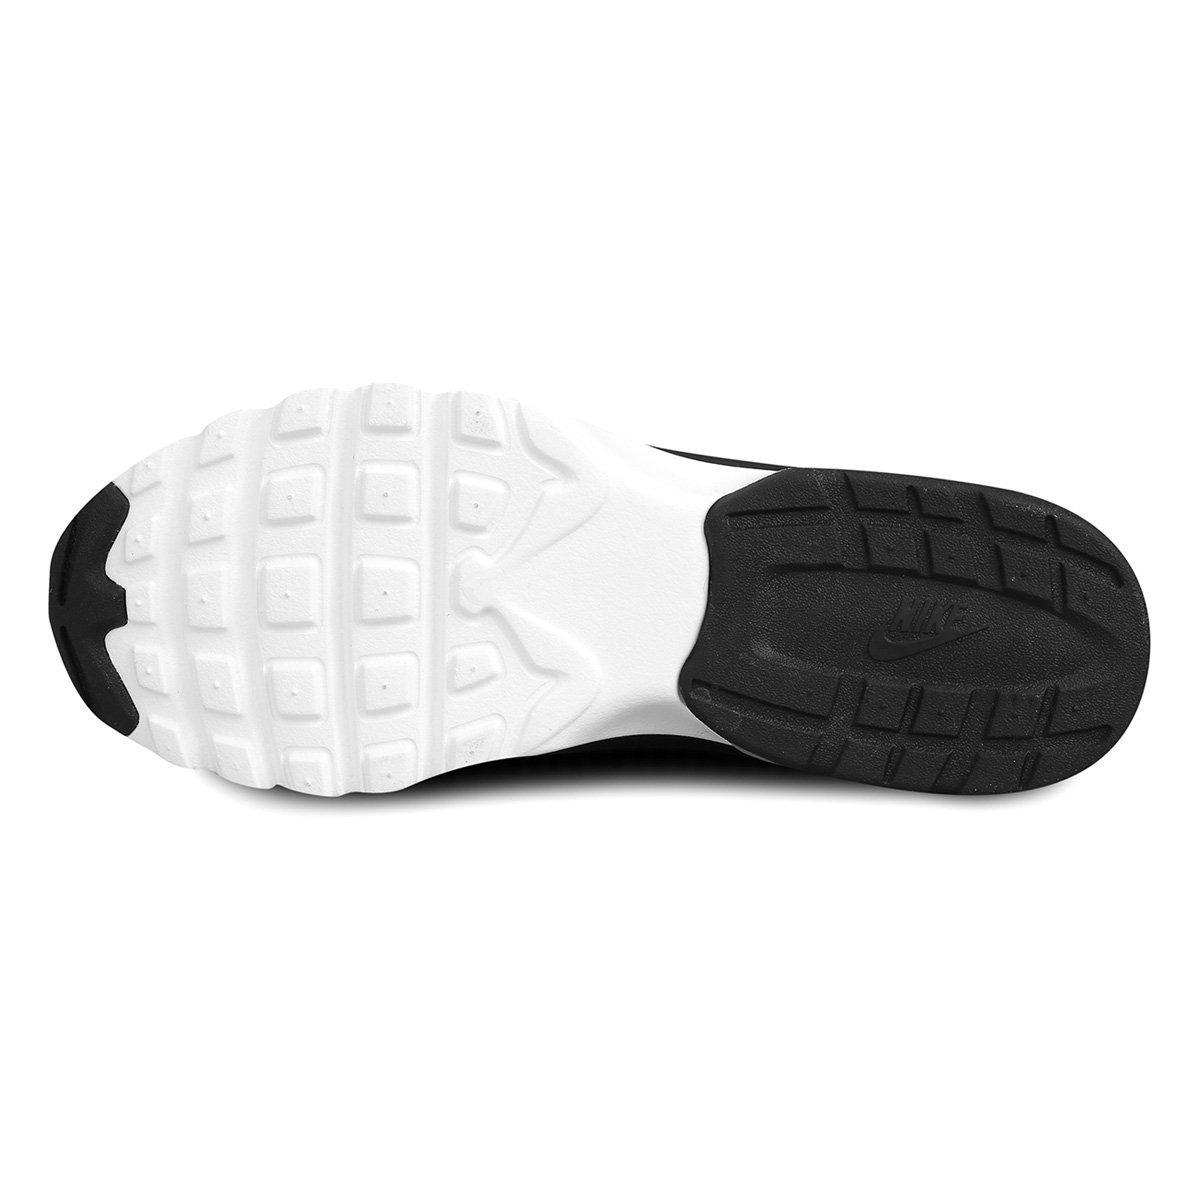 Nike Air Max Invigor Hombre